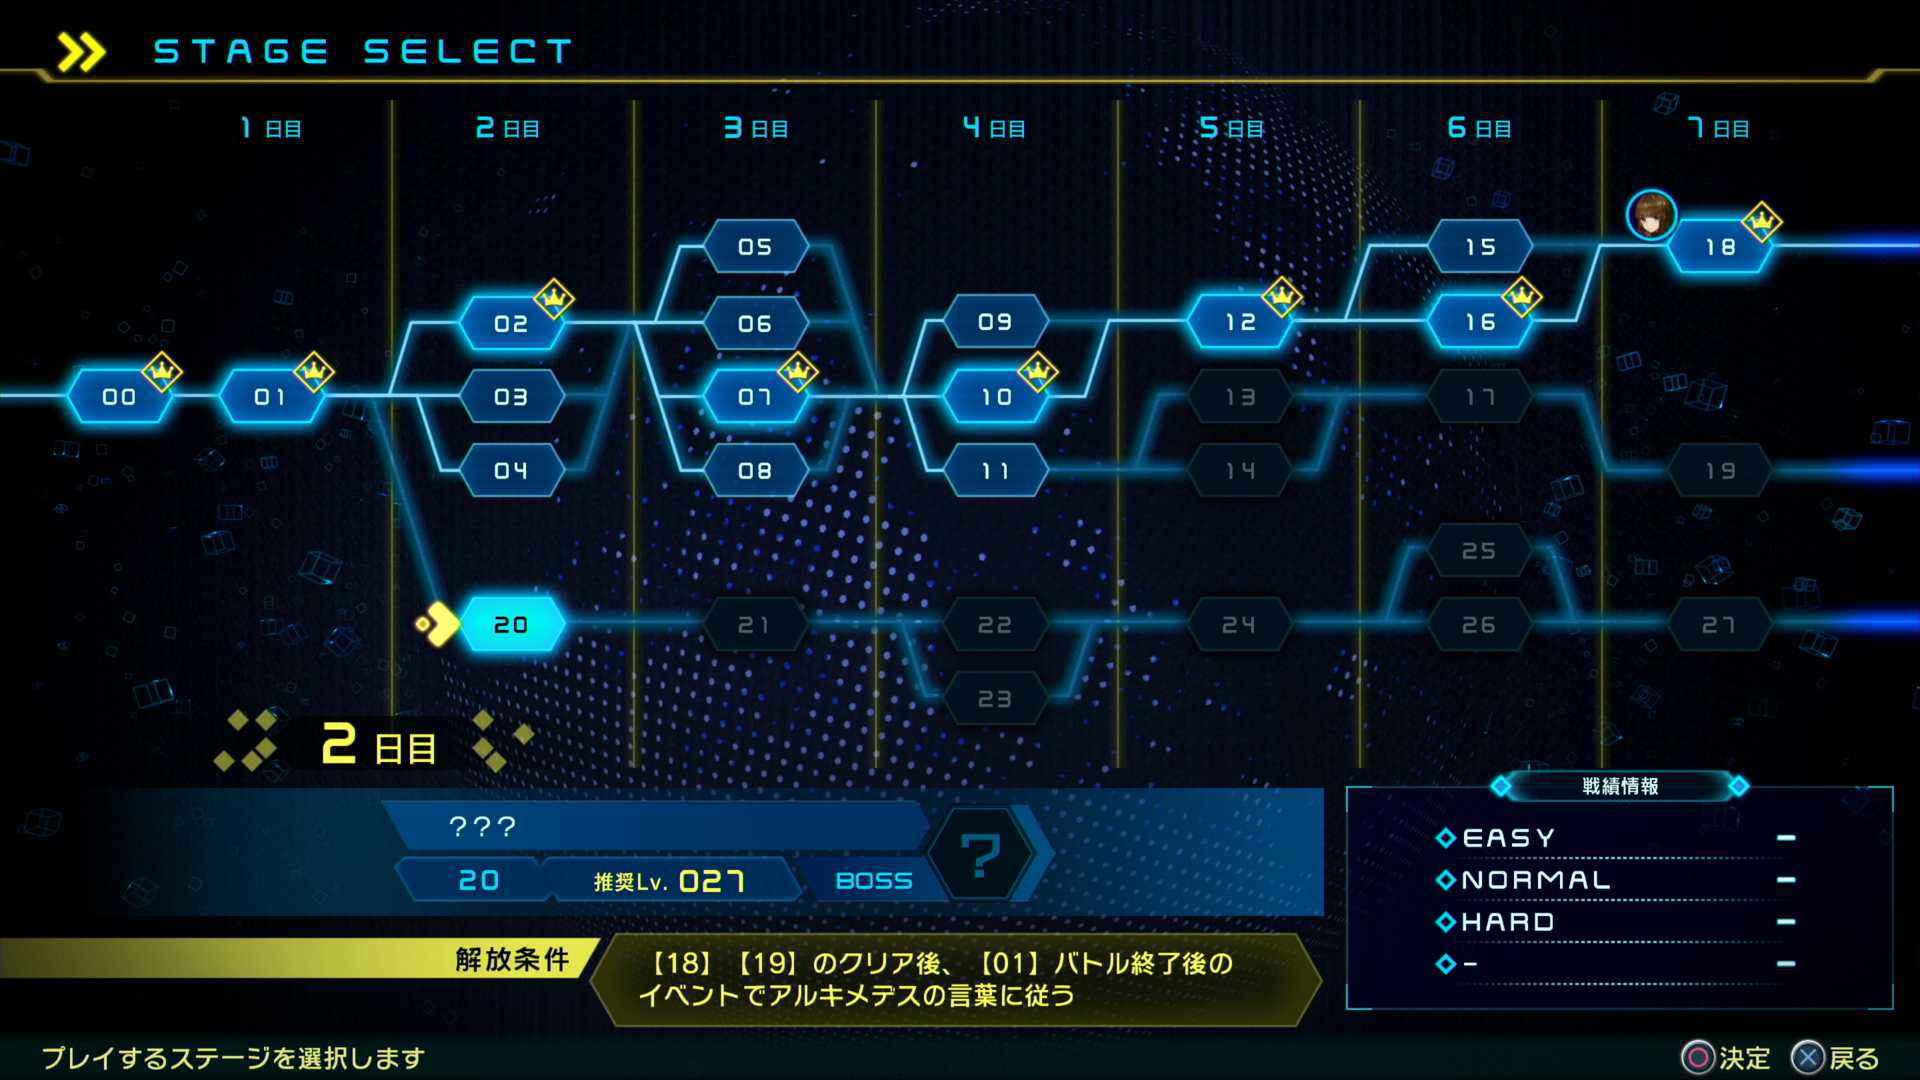 【Fate/EXTELLA LINK攻略】周回プレイある感じって本当?